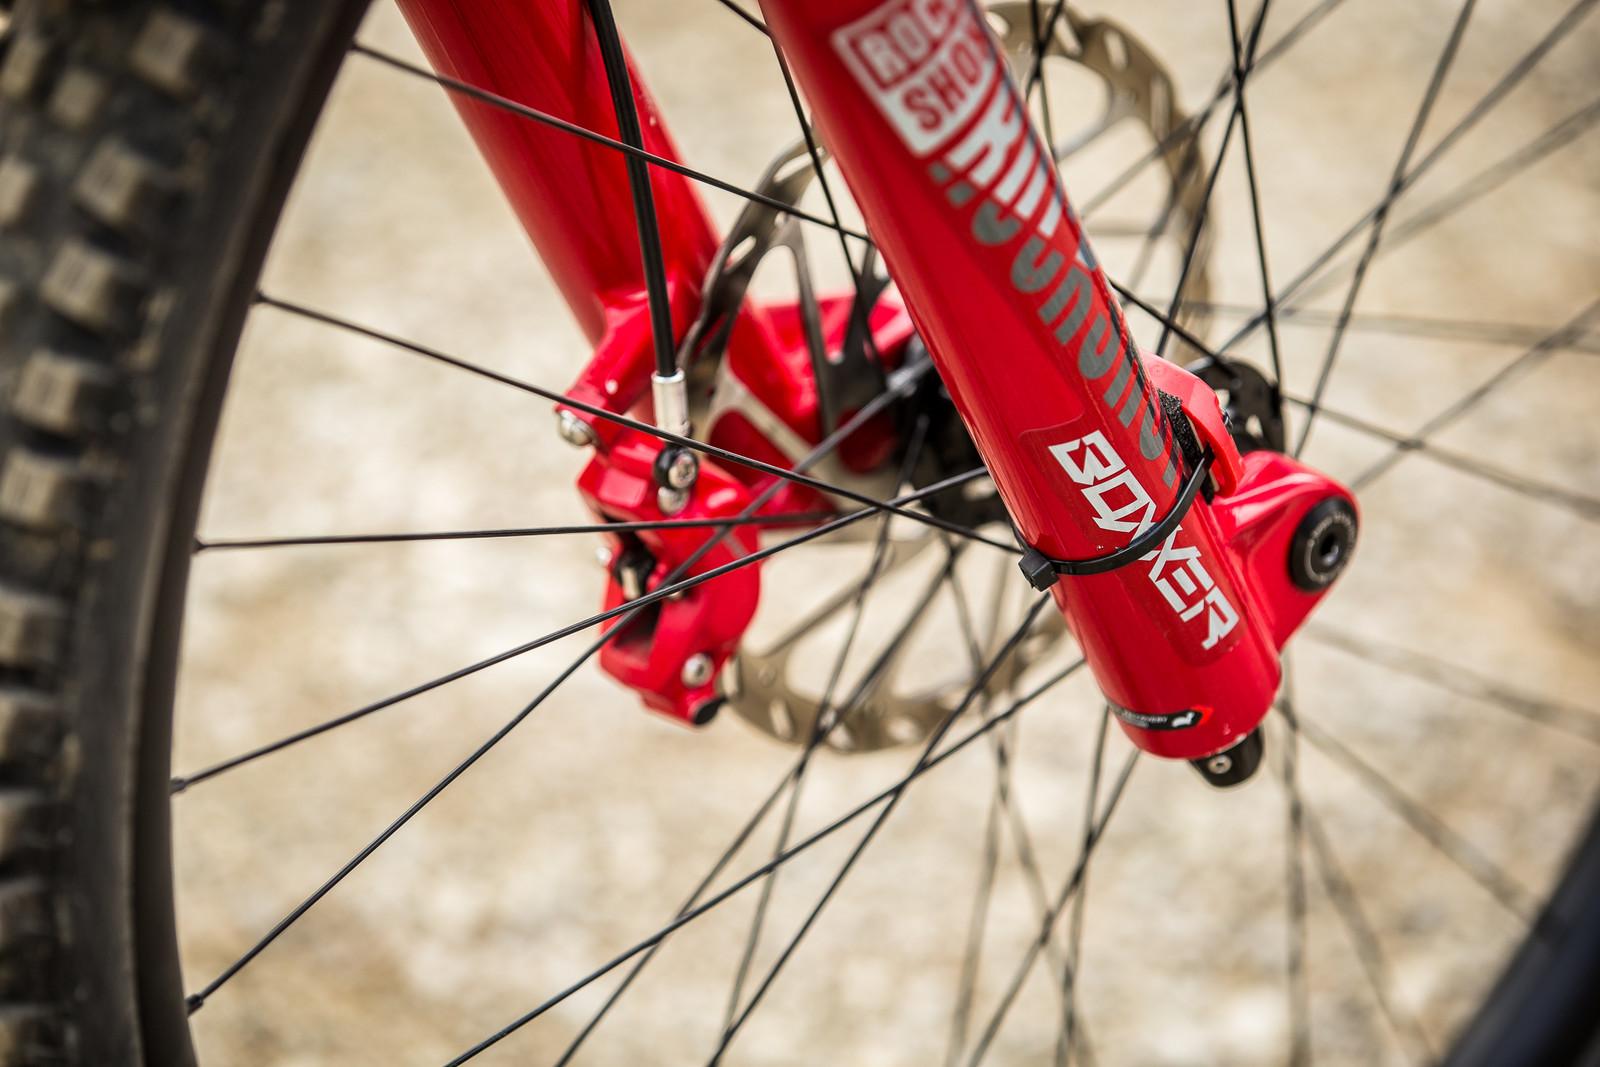 RockShox BoXXer 29 - WINNING BIKE - Amaury Pierron's Commencal Supreme DH 29 - Mountain Biking Pictures - Vital MTB